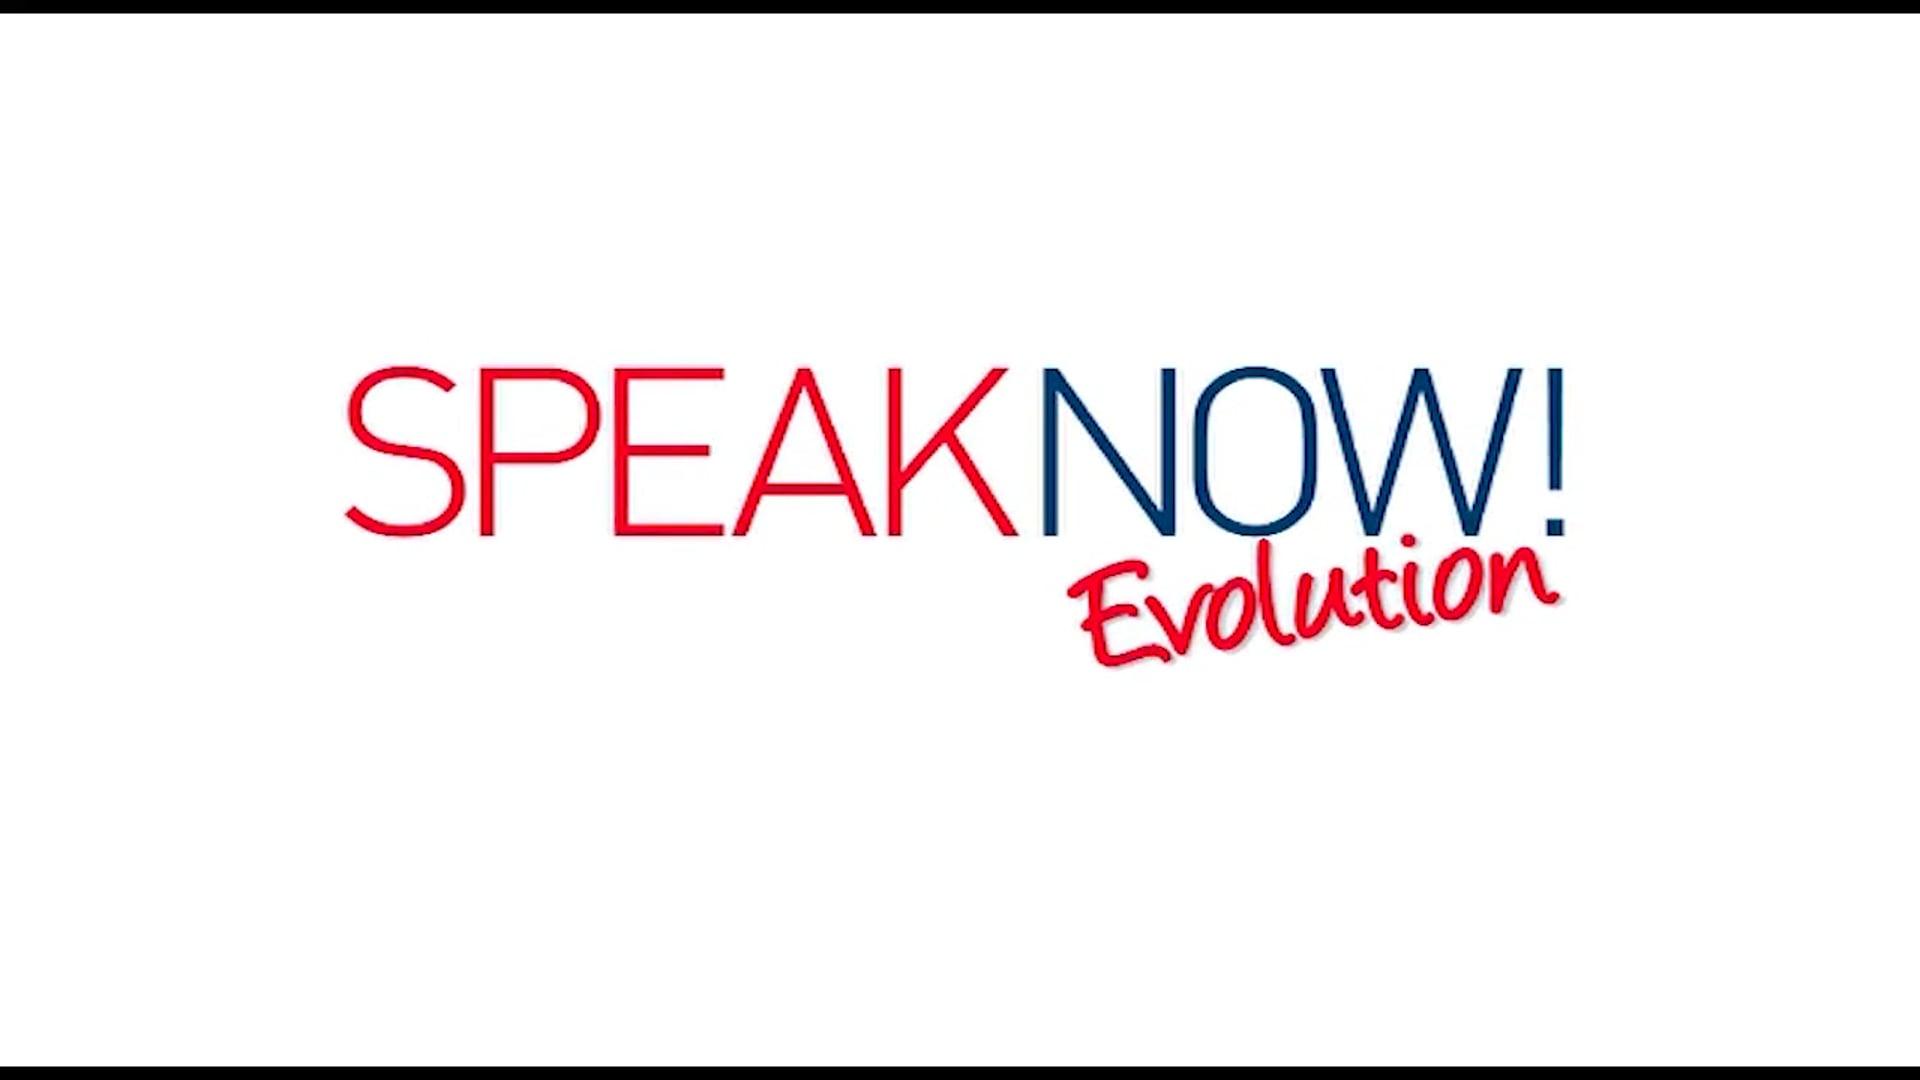 SPEAK NOW EVOLUTION SIGLA